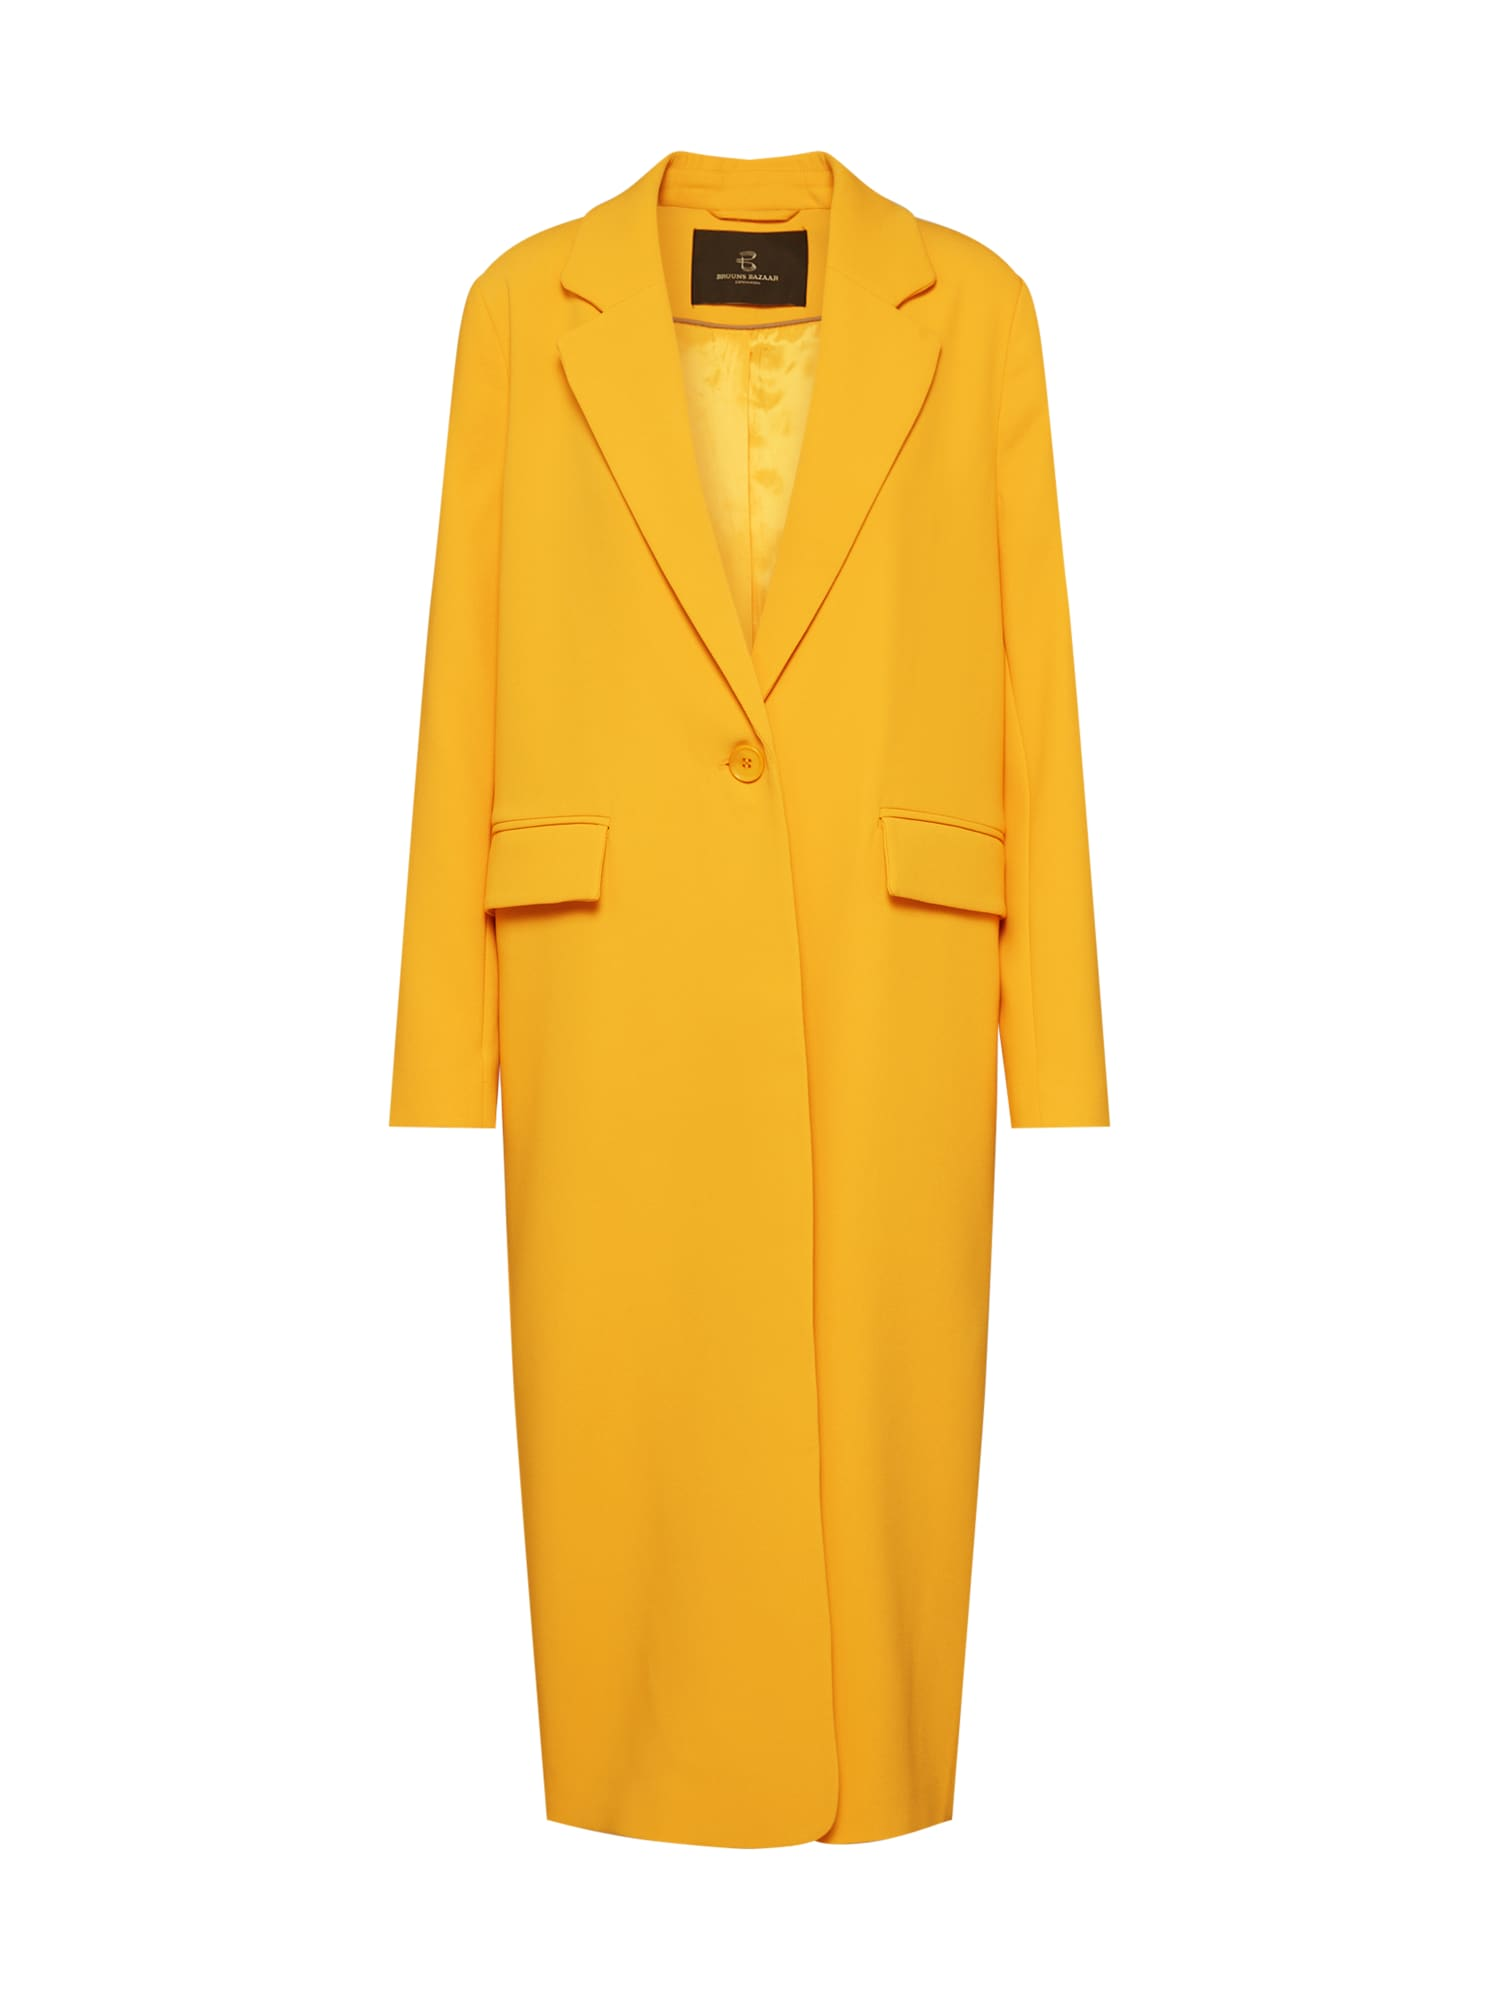 BRUUNS BAZAAR Rudeninis-žieminis paltas 'Floras Alanna' aukso geltonumo spalva